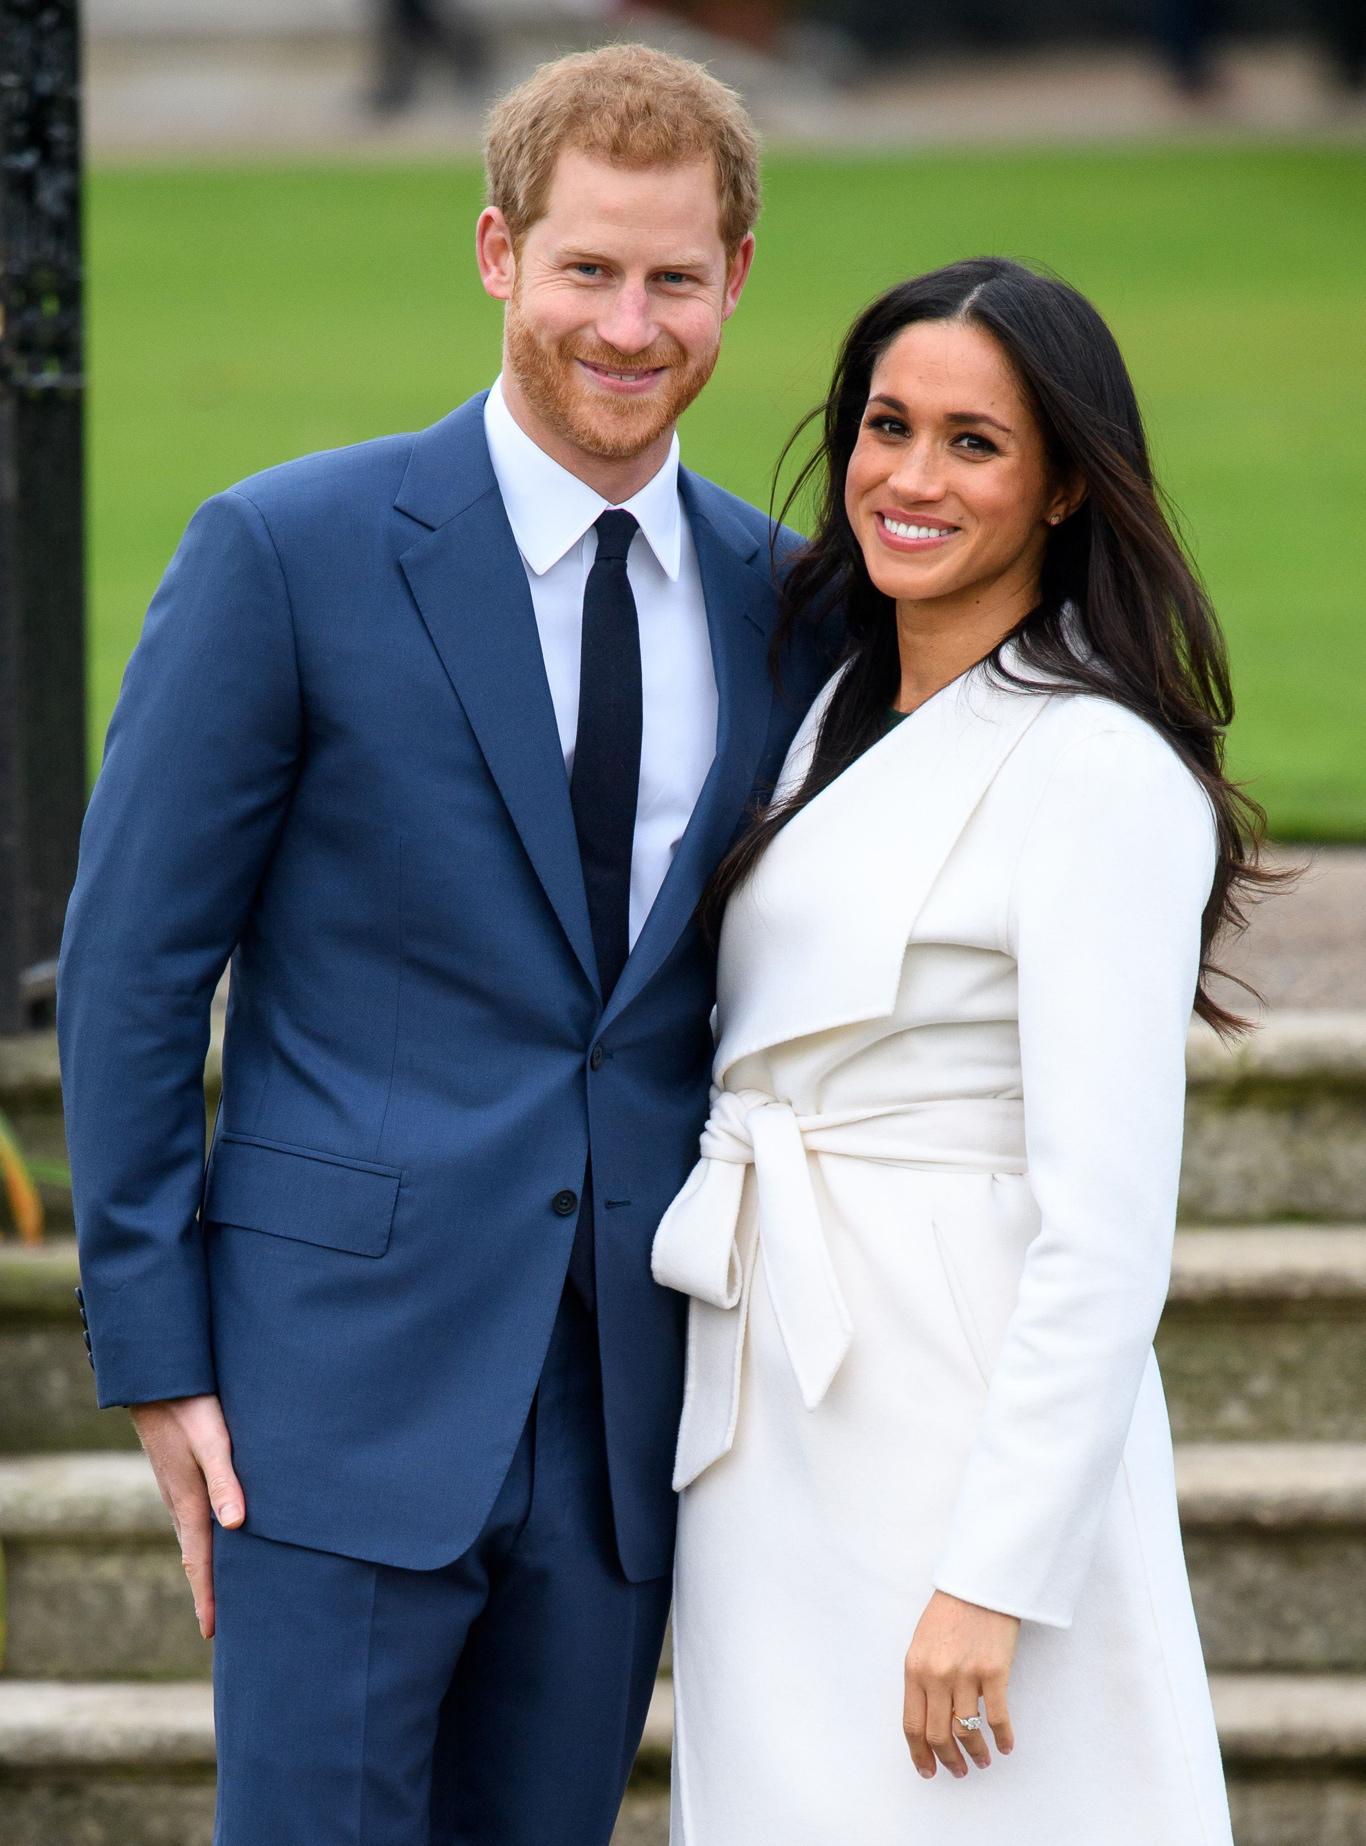 Prince Harry and Meghan MarklePrince Harry and Meghan Markle engagement announcement, Kensington Palace, London, UK - 27 Nov 2017